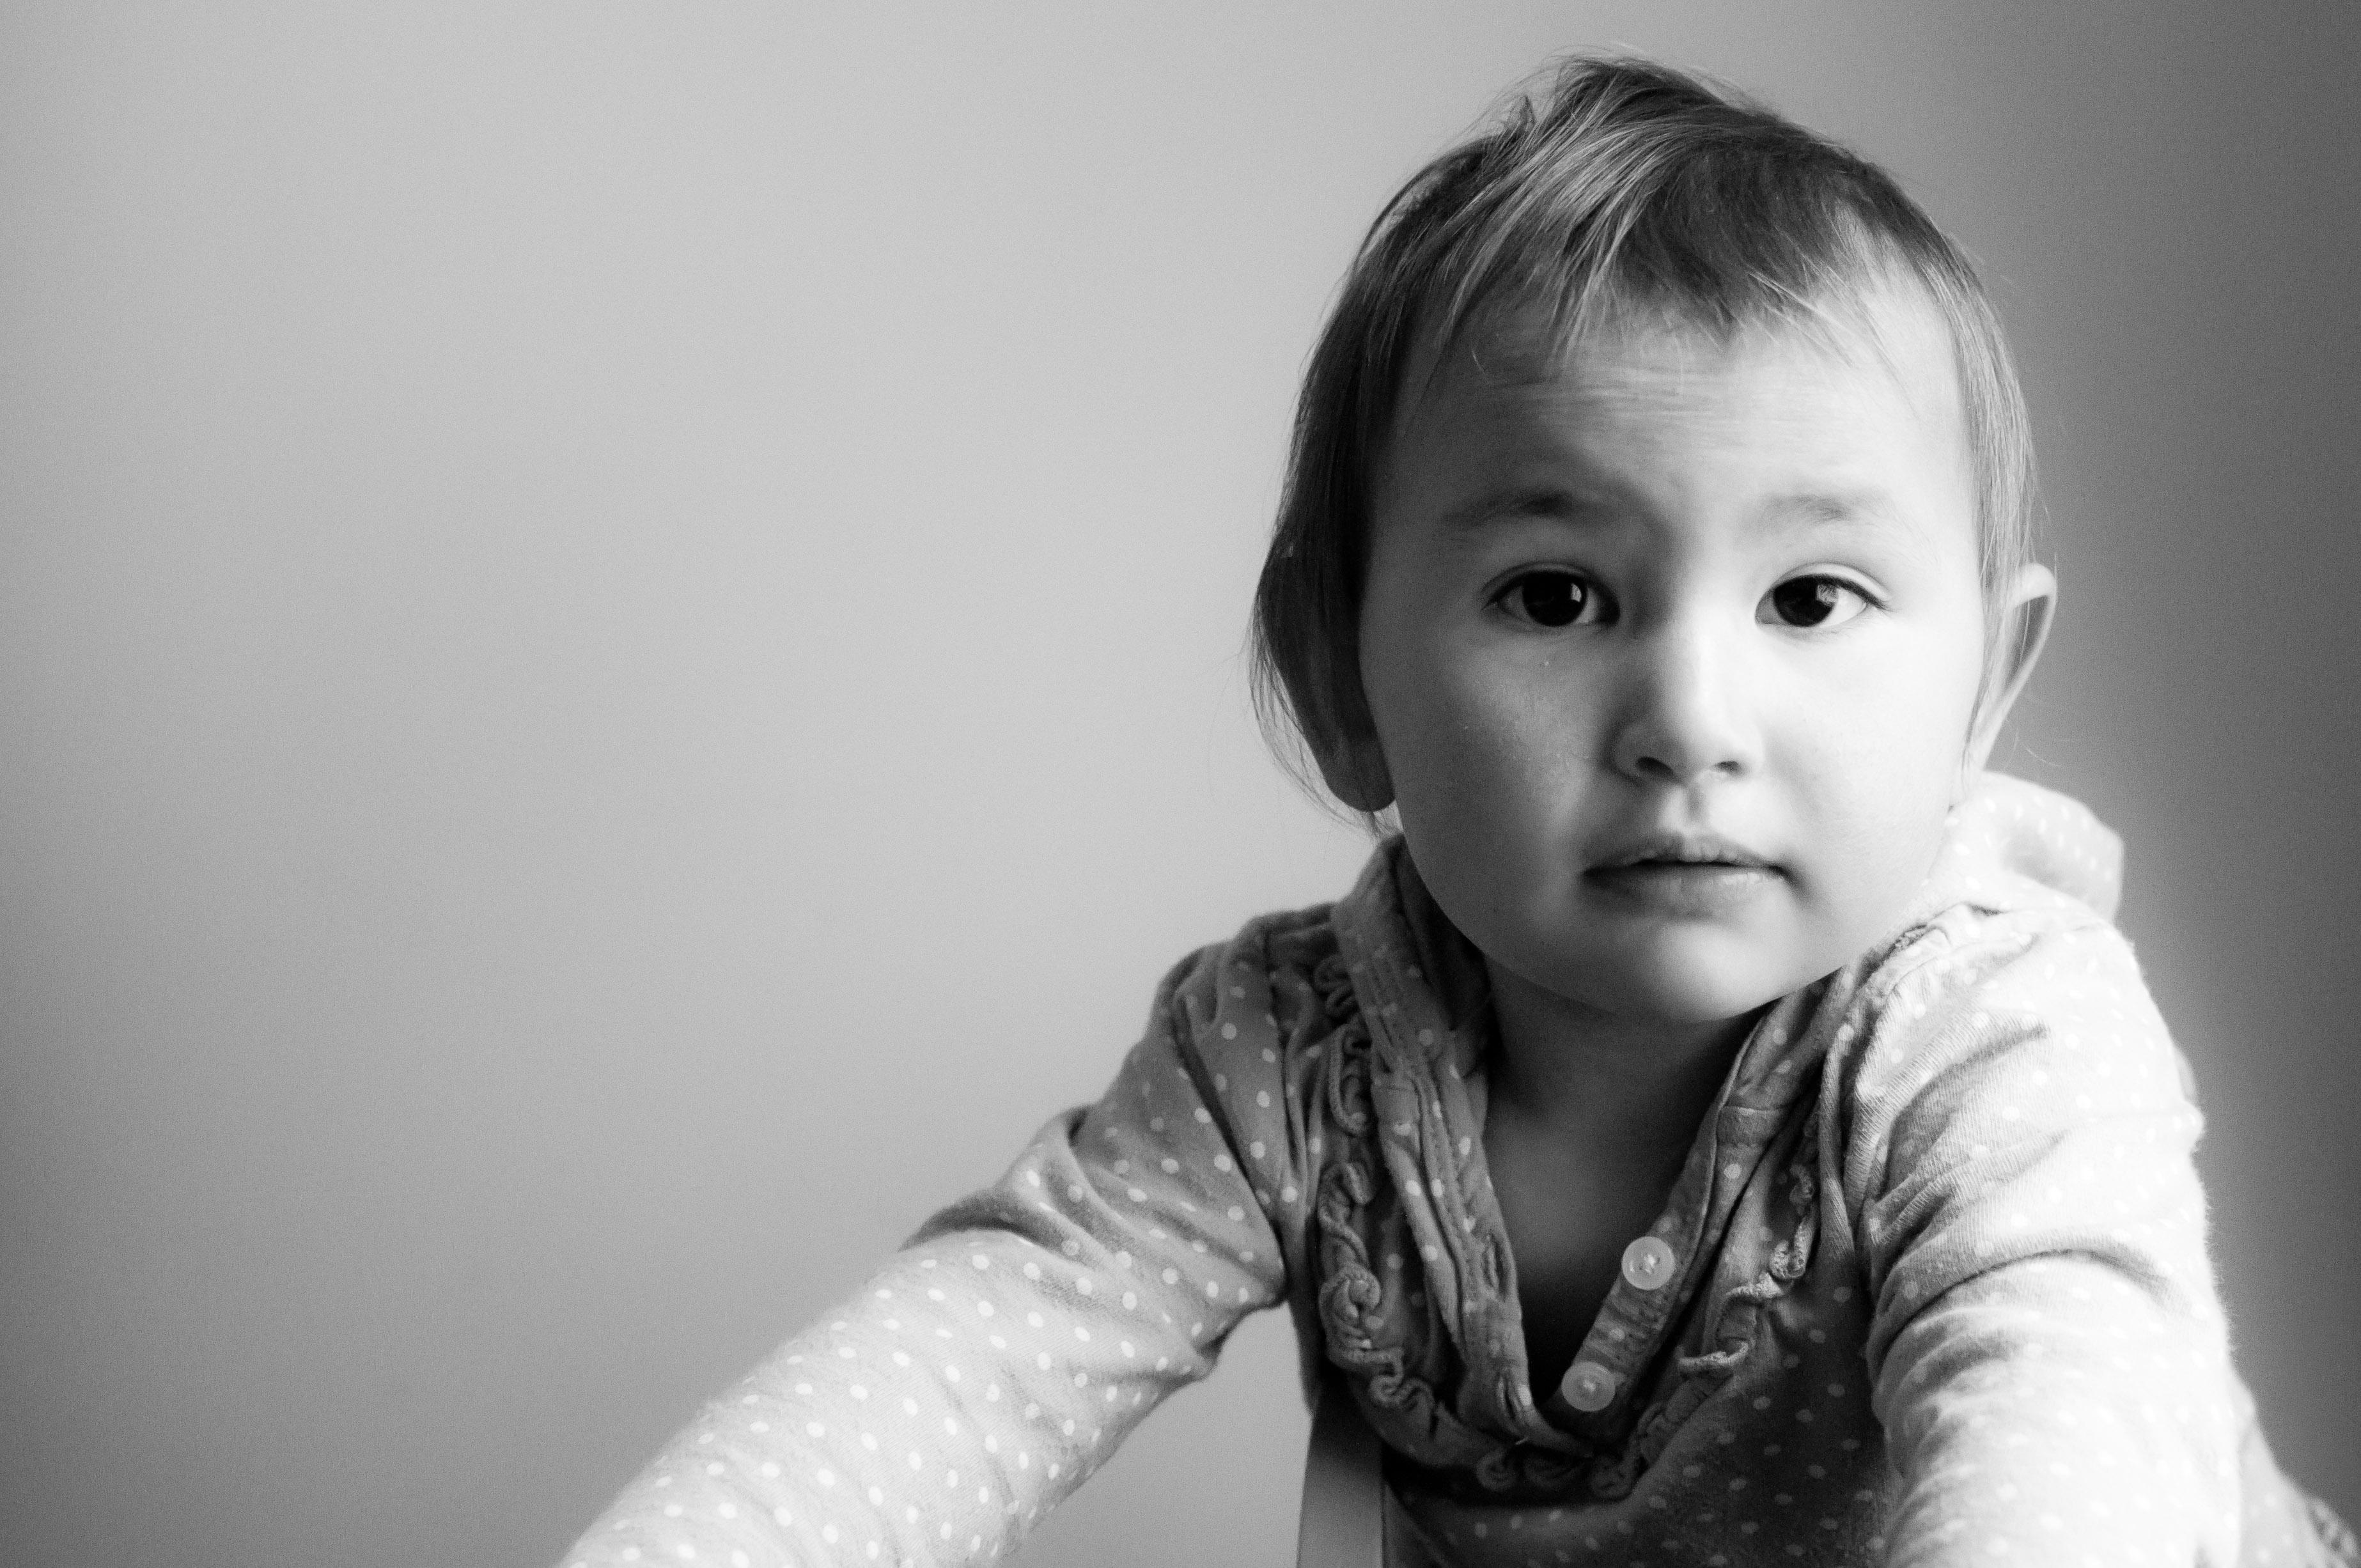 Celia, at 18 months